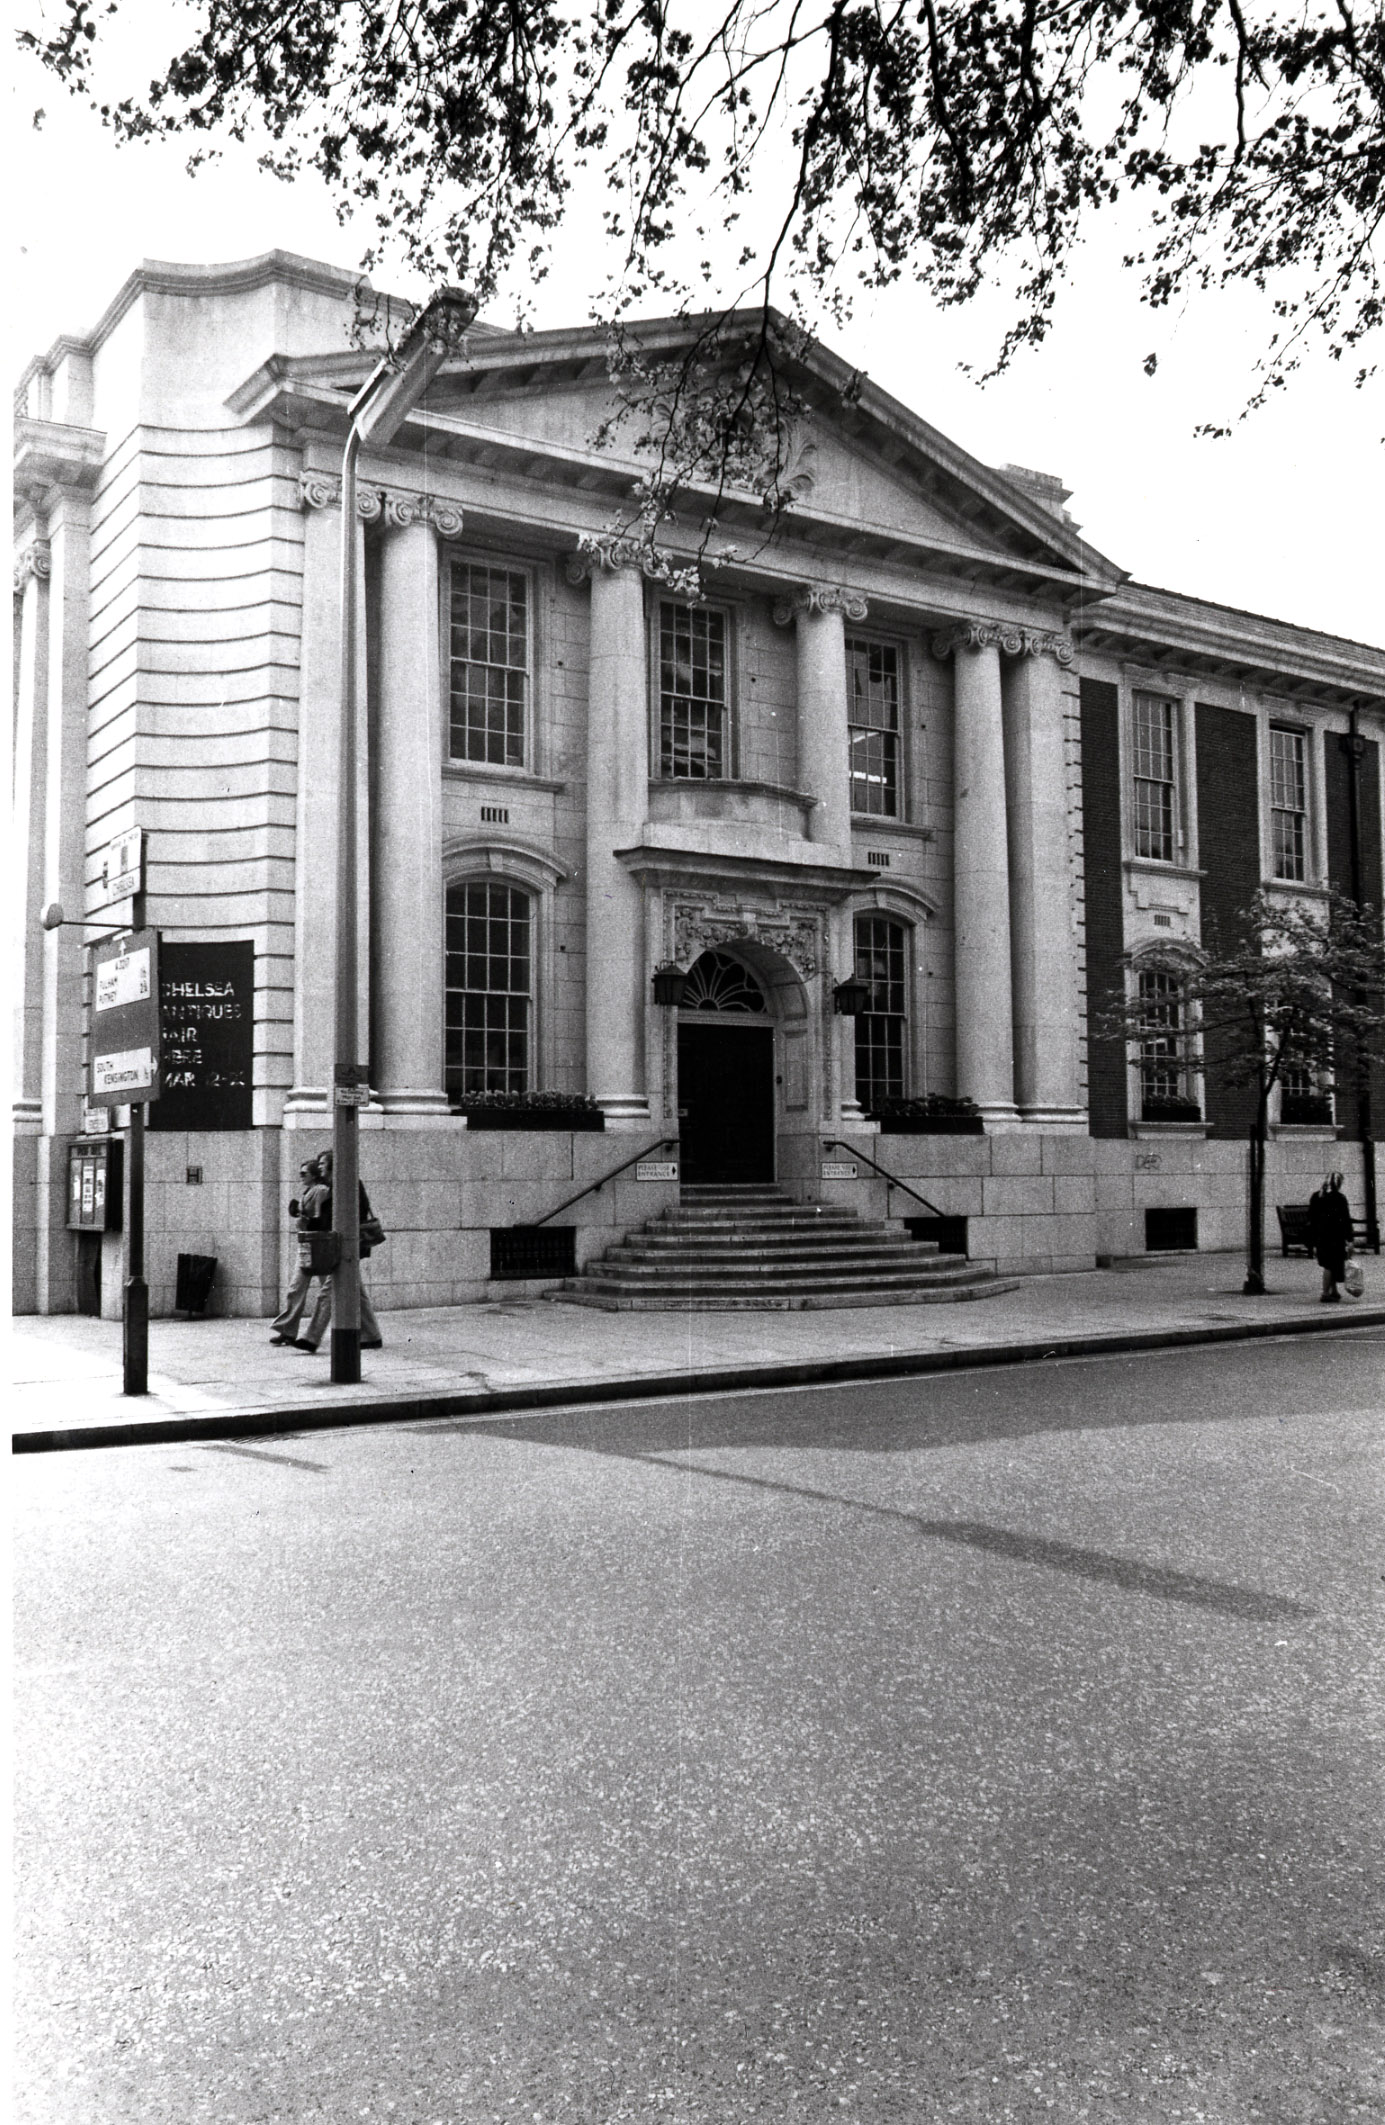 Kings Road - south side, east entrance of Chelsea Old Town Hall 1974 KS 4453.JPG